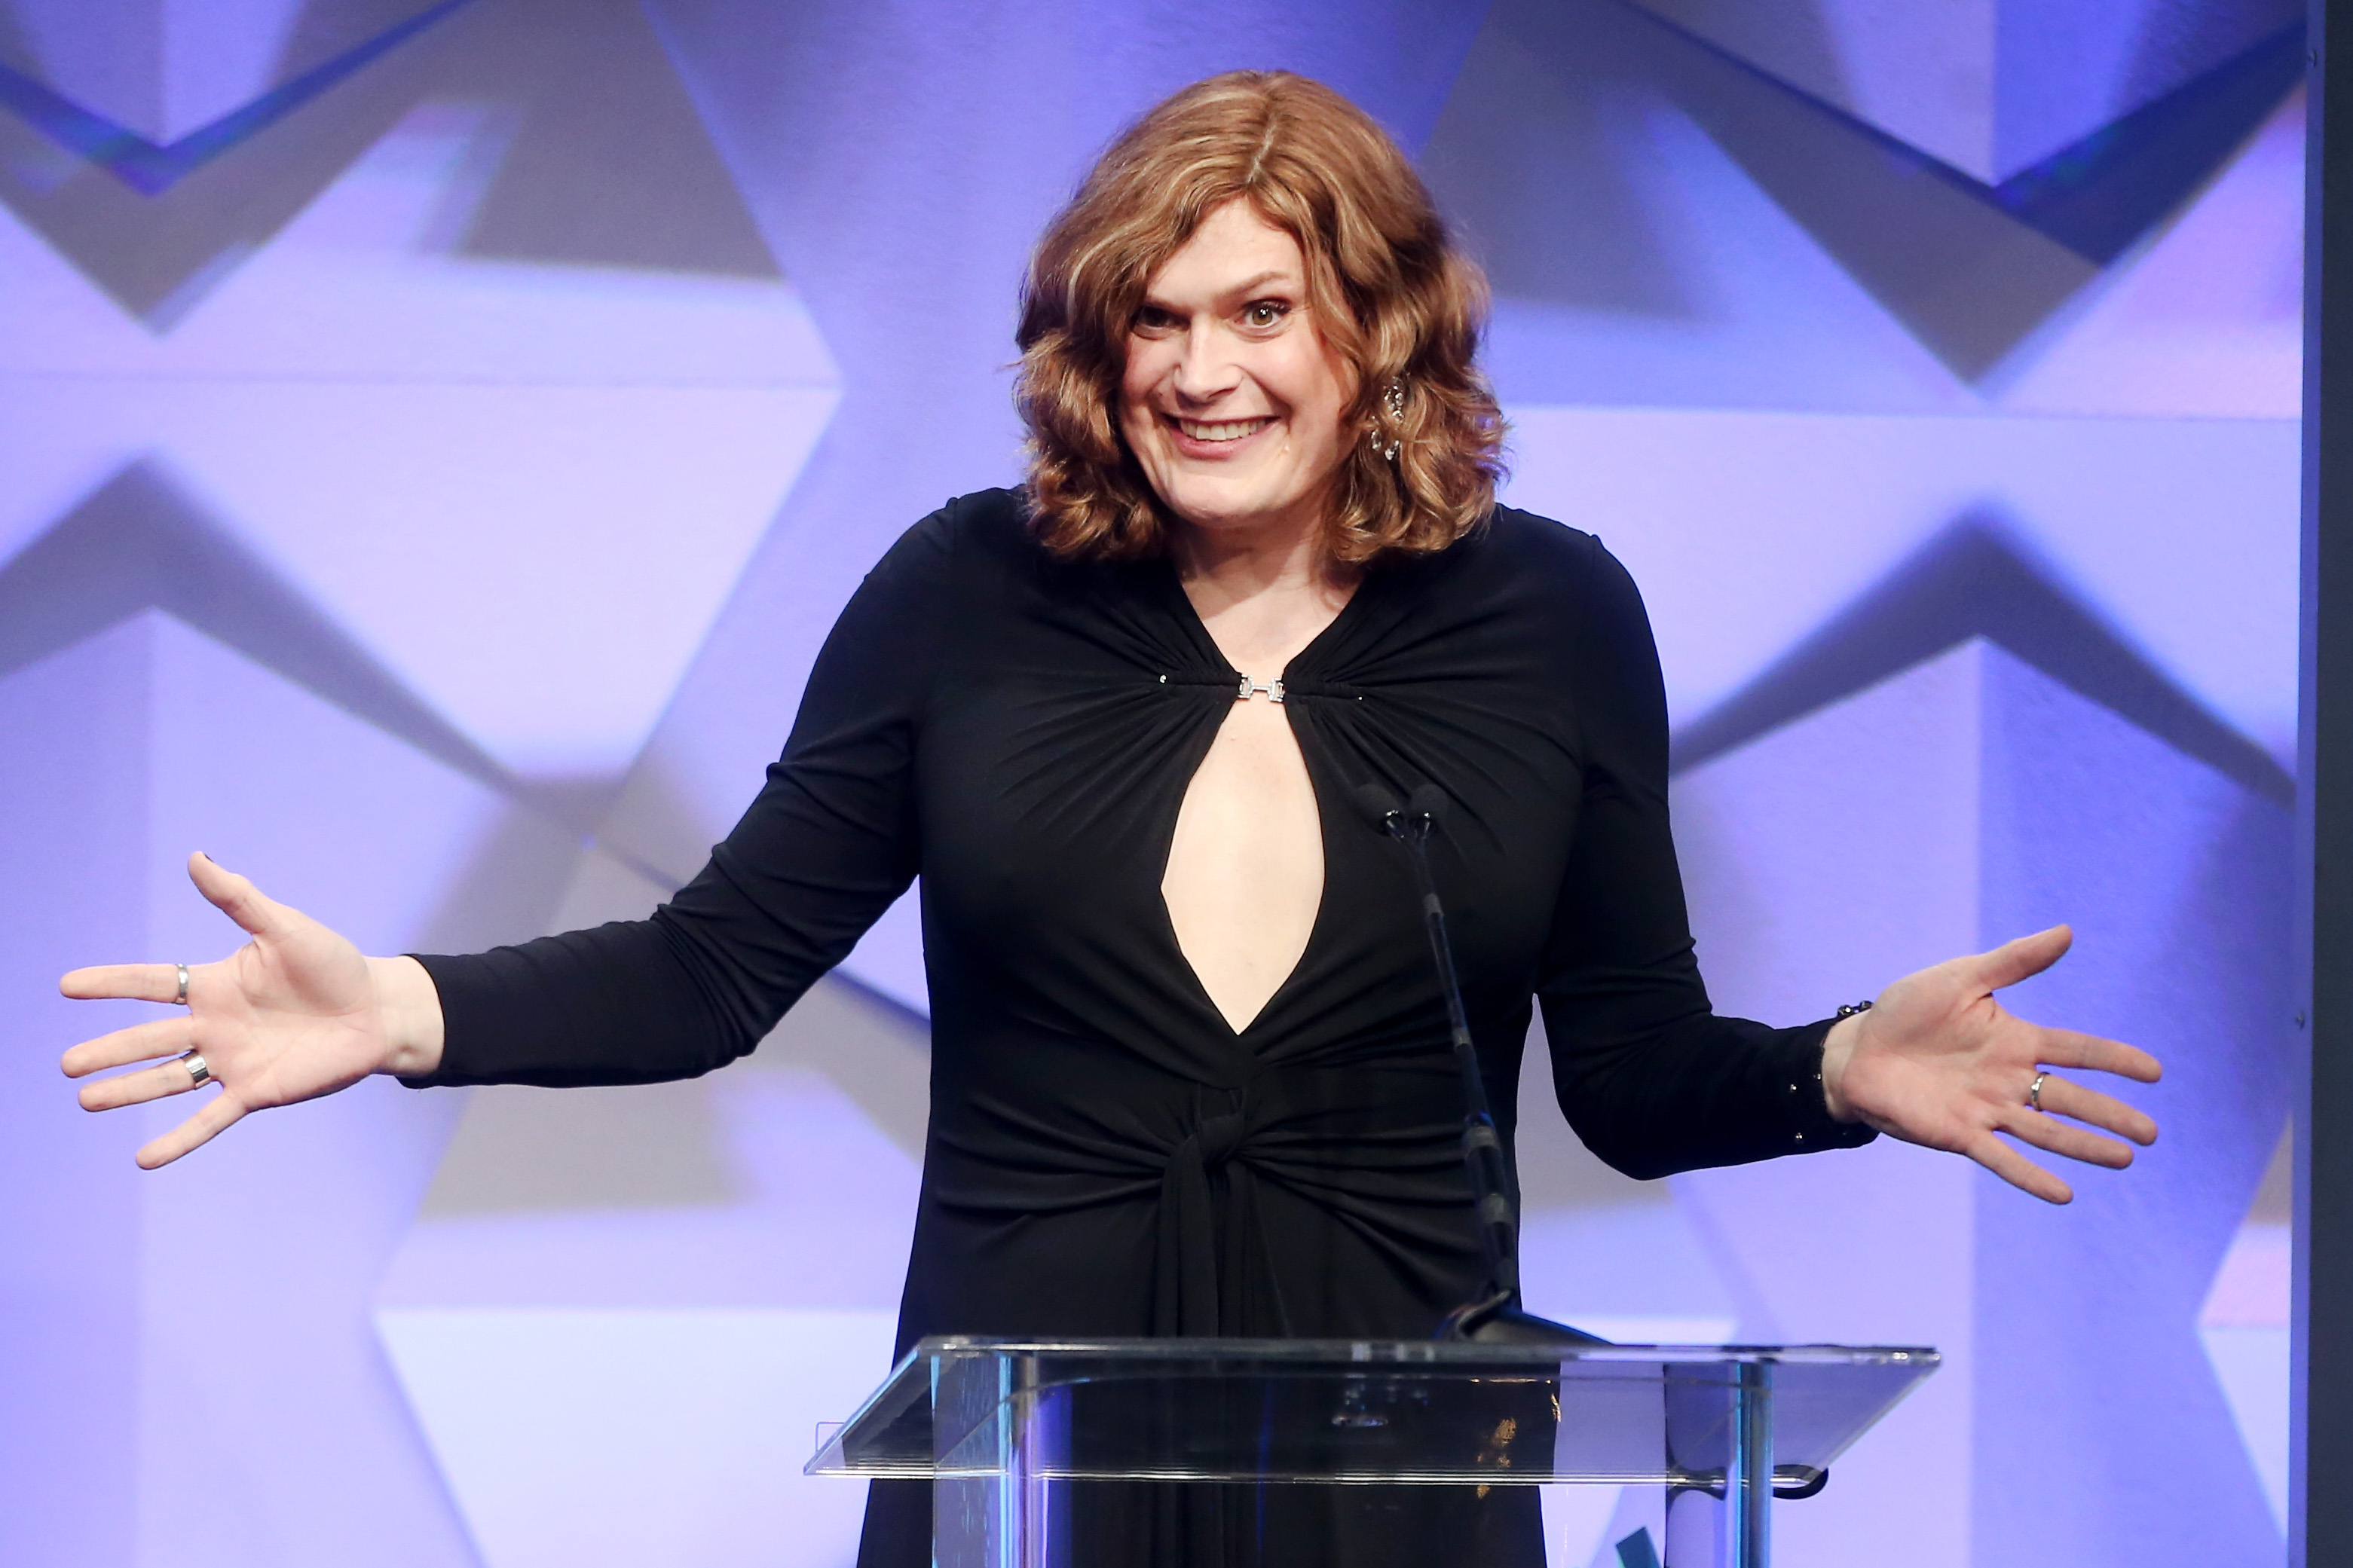 Director Lilly Wachowski steps down from Netflix's